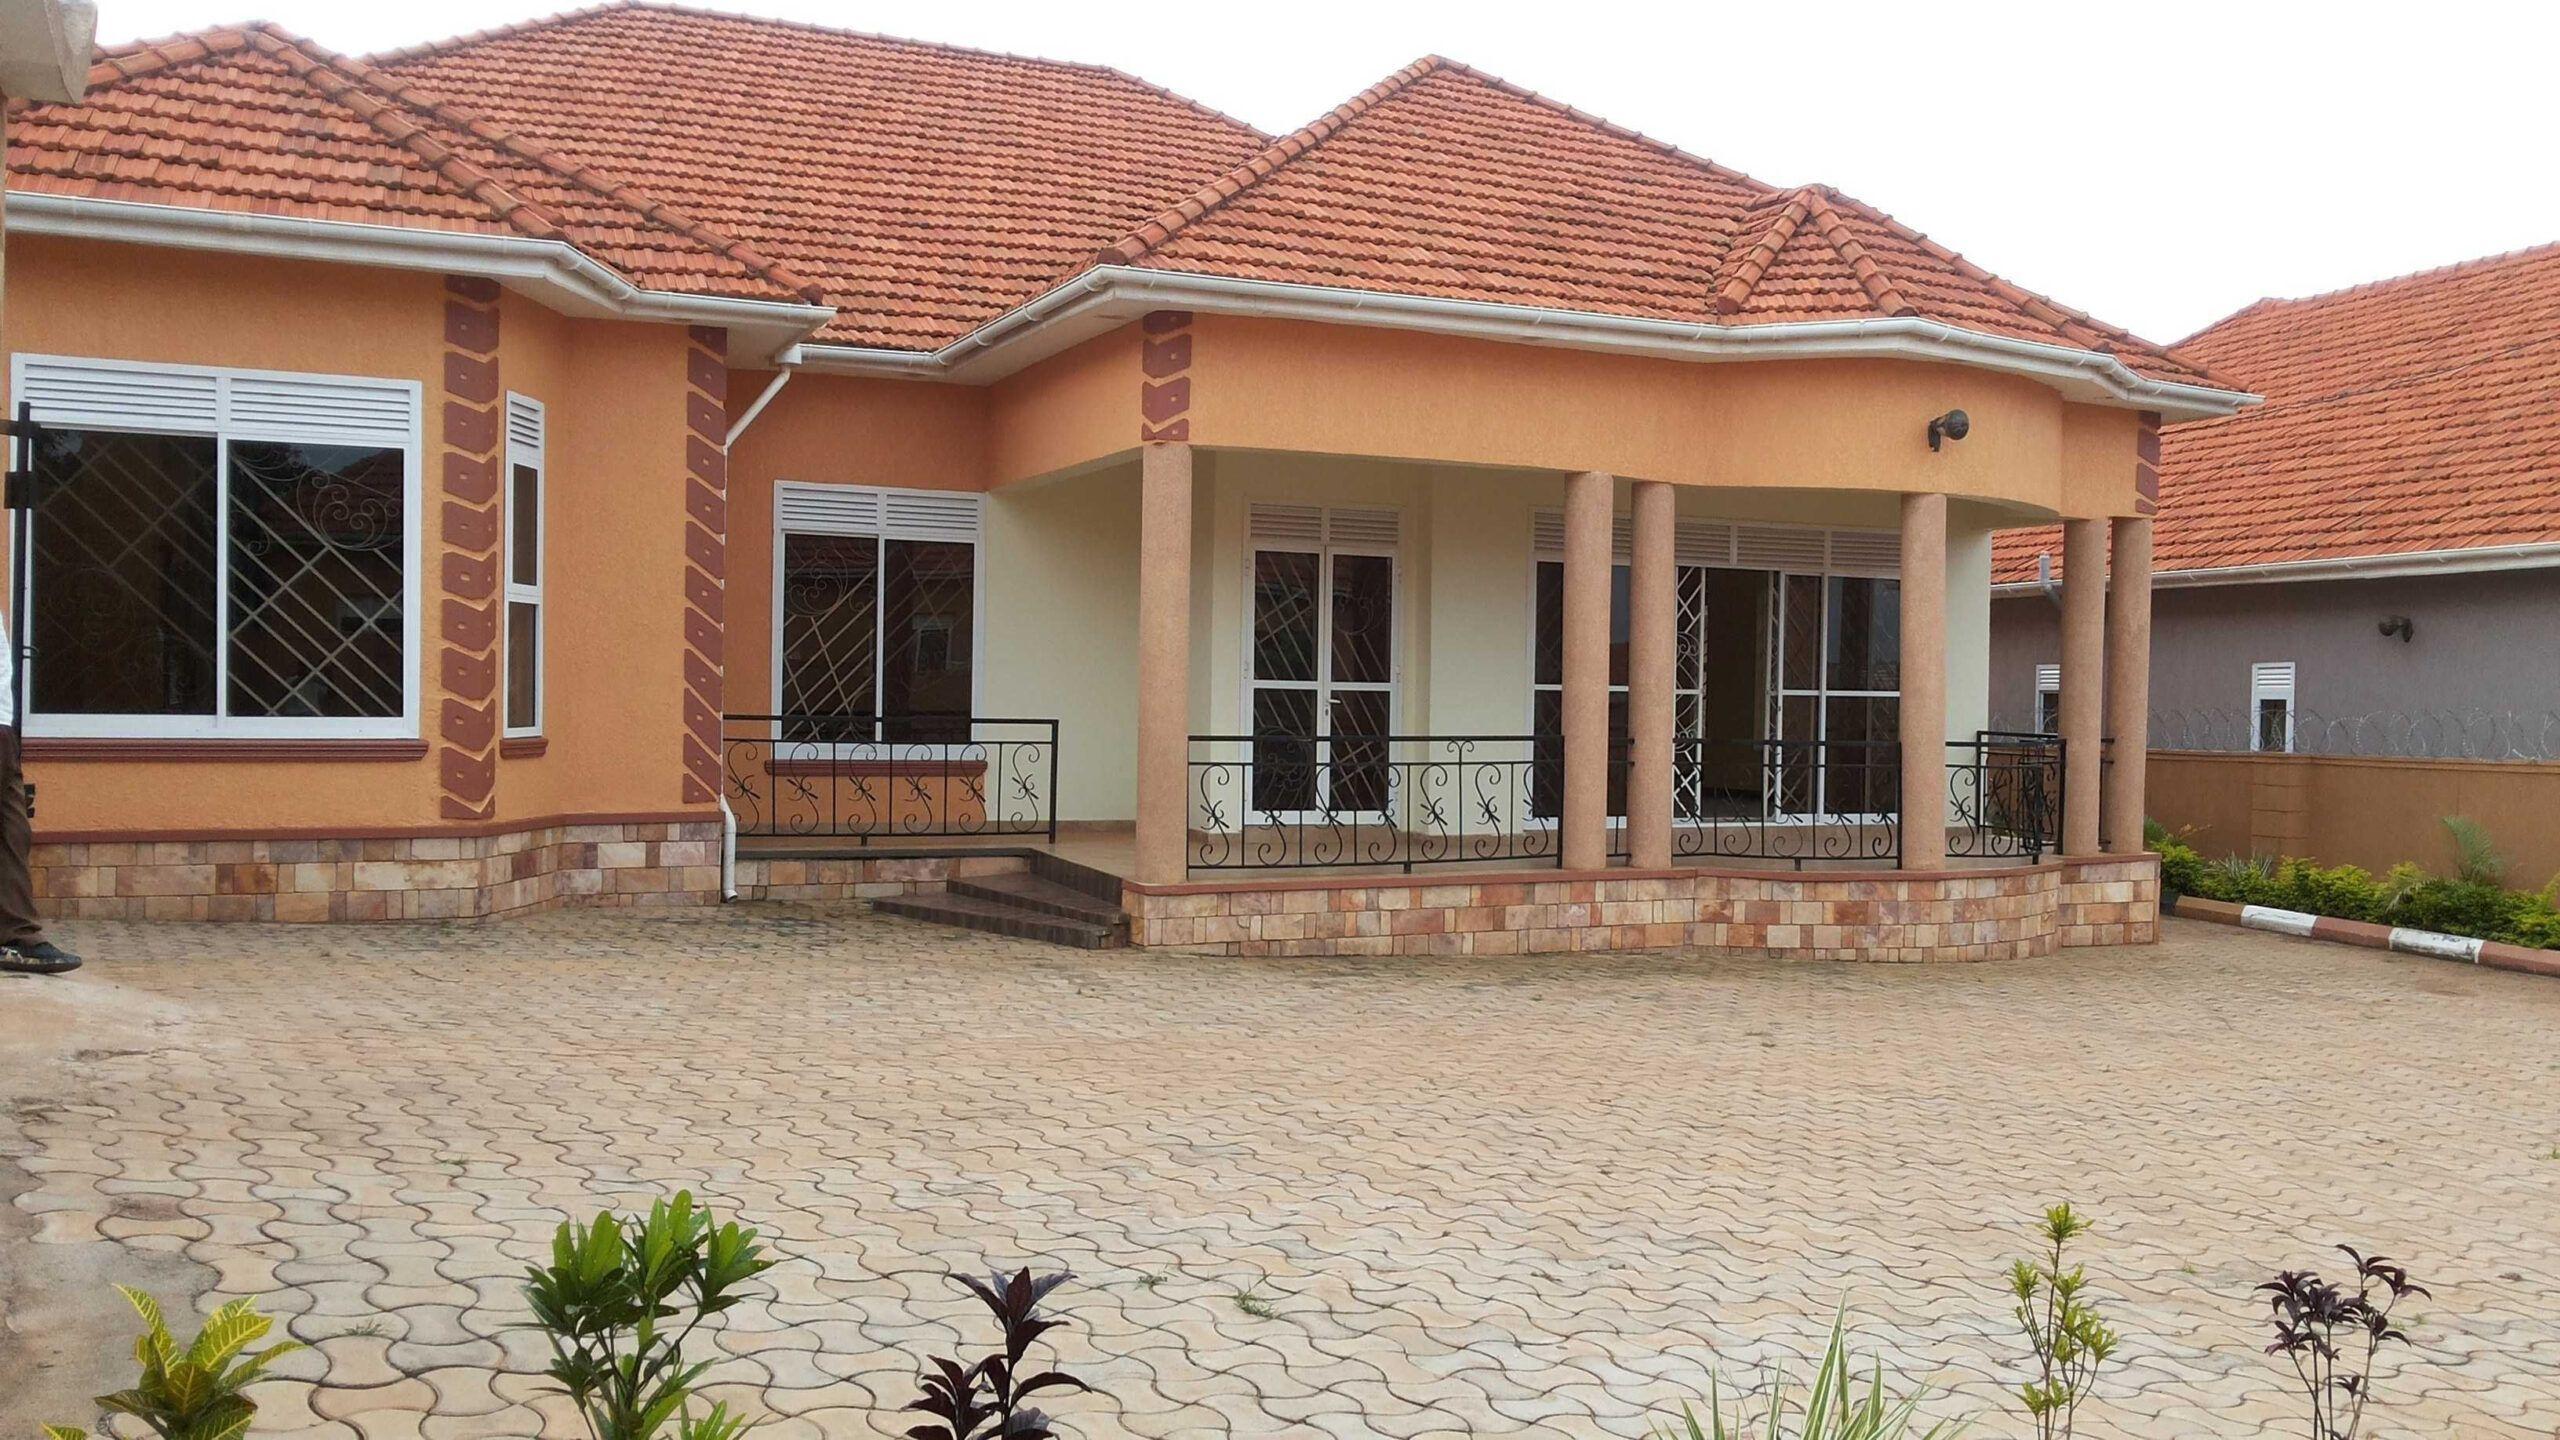 4 Bedroom Bungalow House Plans In Uganda In 2020 4 Bedroom House Plans Bedroom House Plans Beautiful House Plans